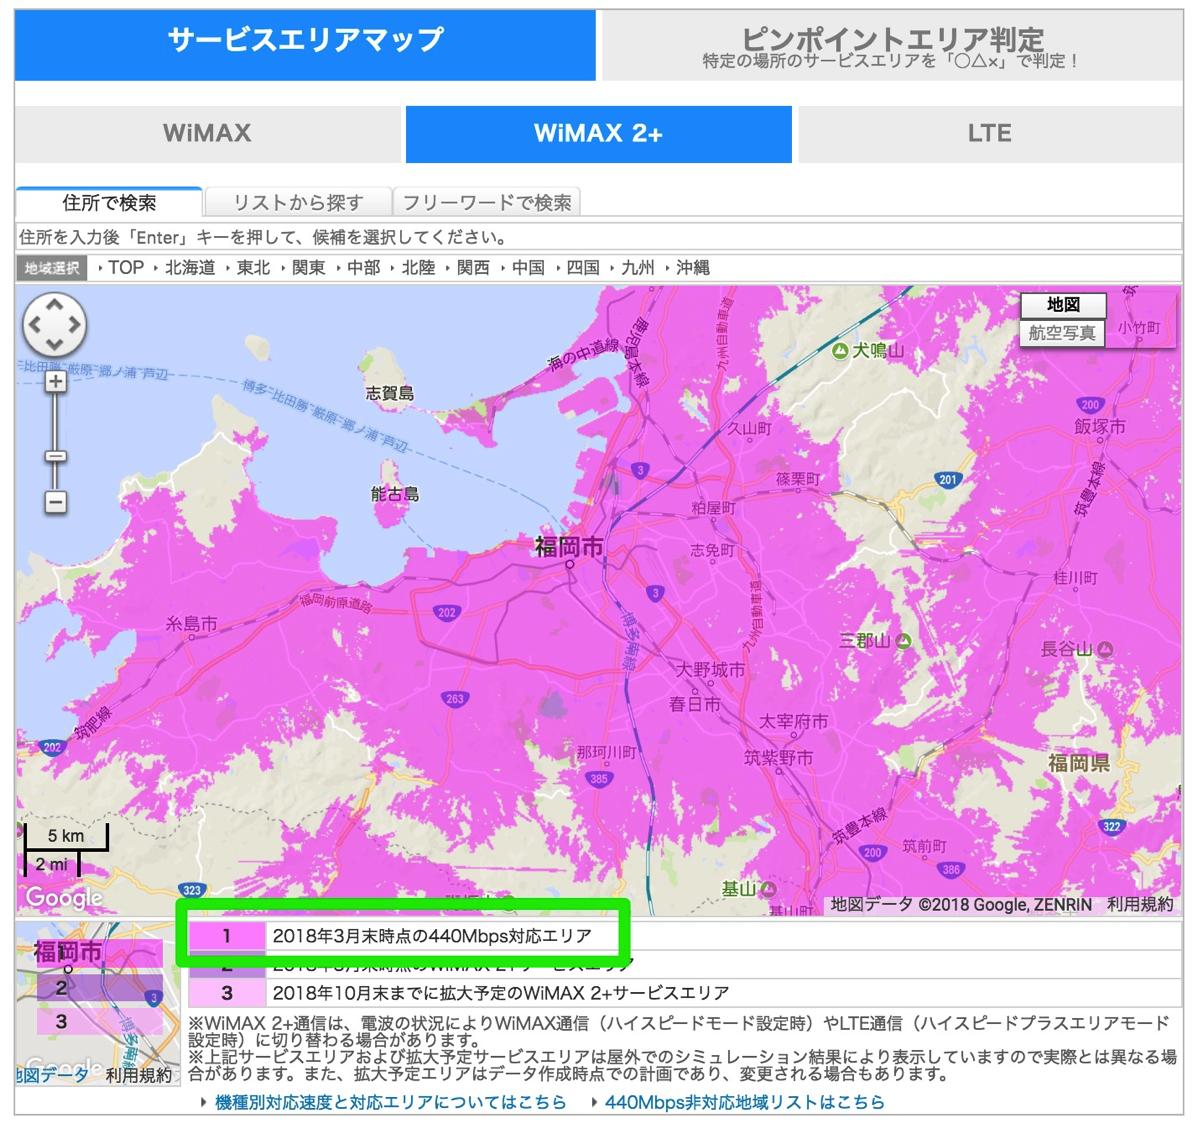 WiMAX 2+エリアマップ(福岡県)